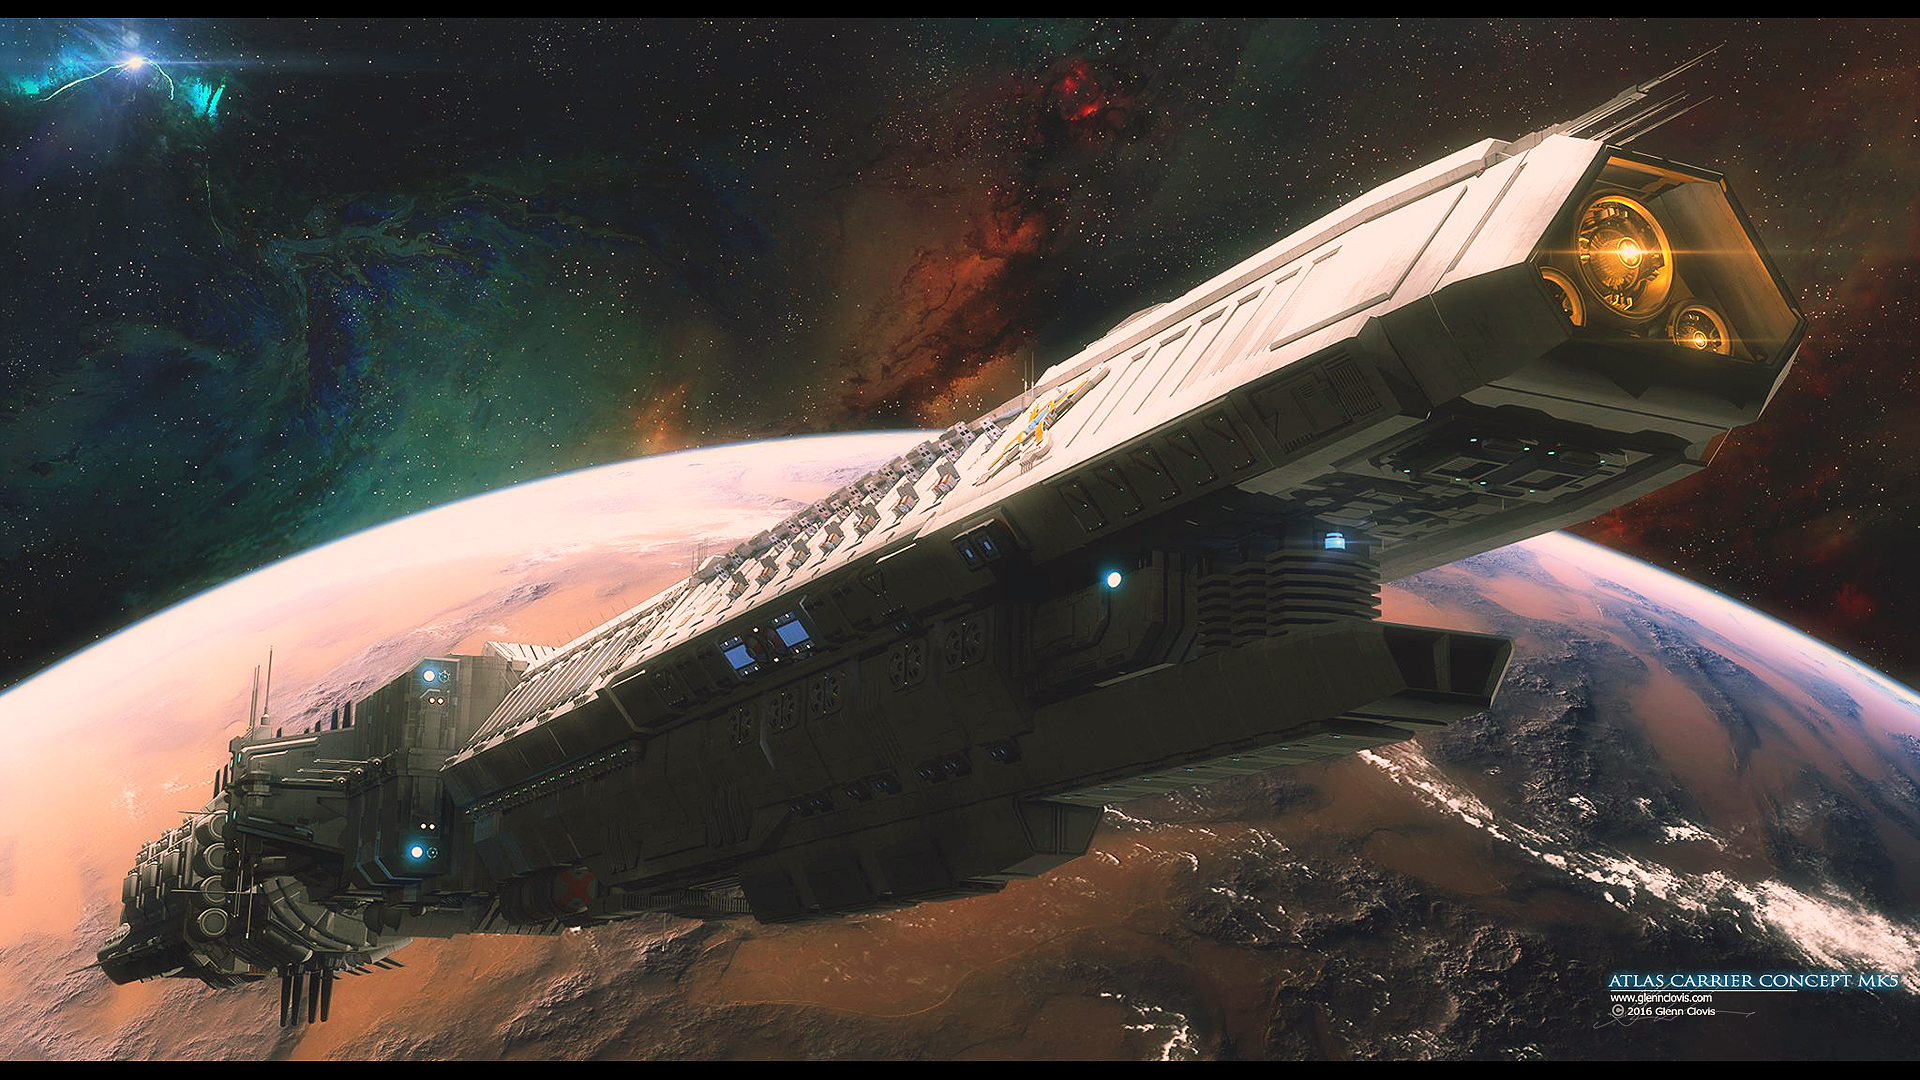 Atlas Carrier Concept MK5 by GlennClovis on DeviantArt